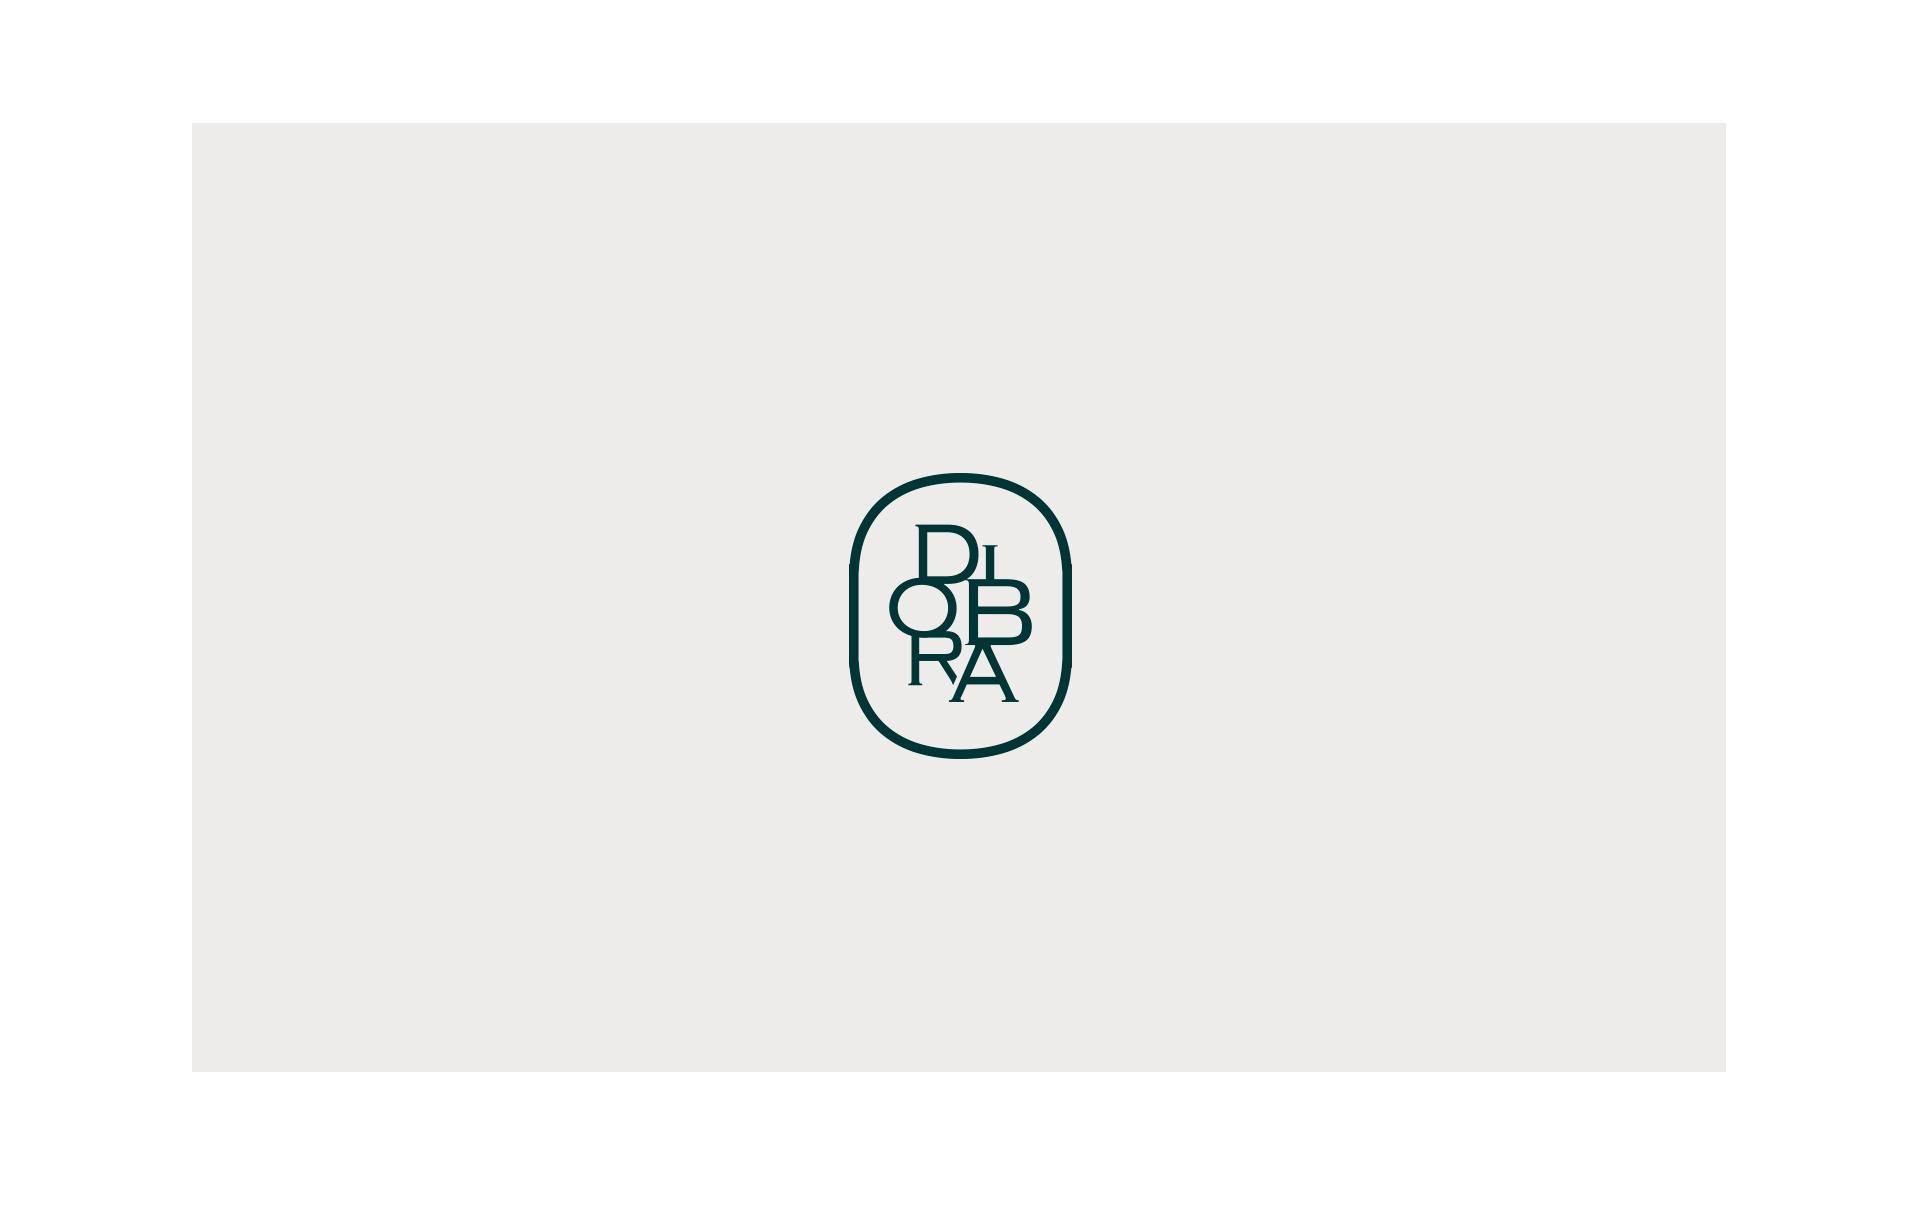 4diobra_identity_typograhpic_logo_design_leconcepteur_tamarapruis